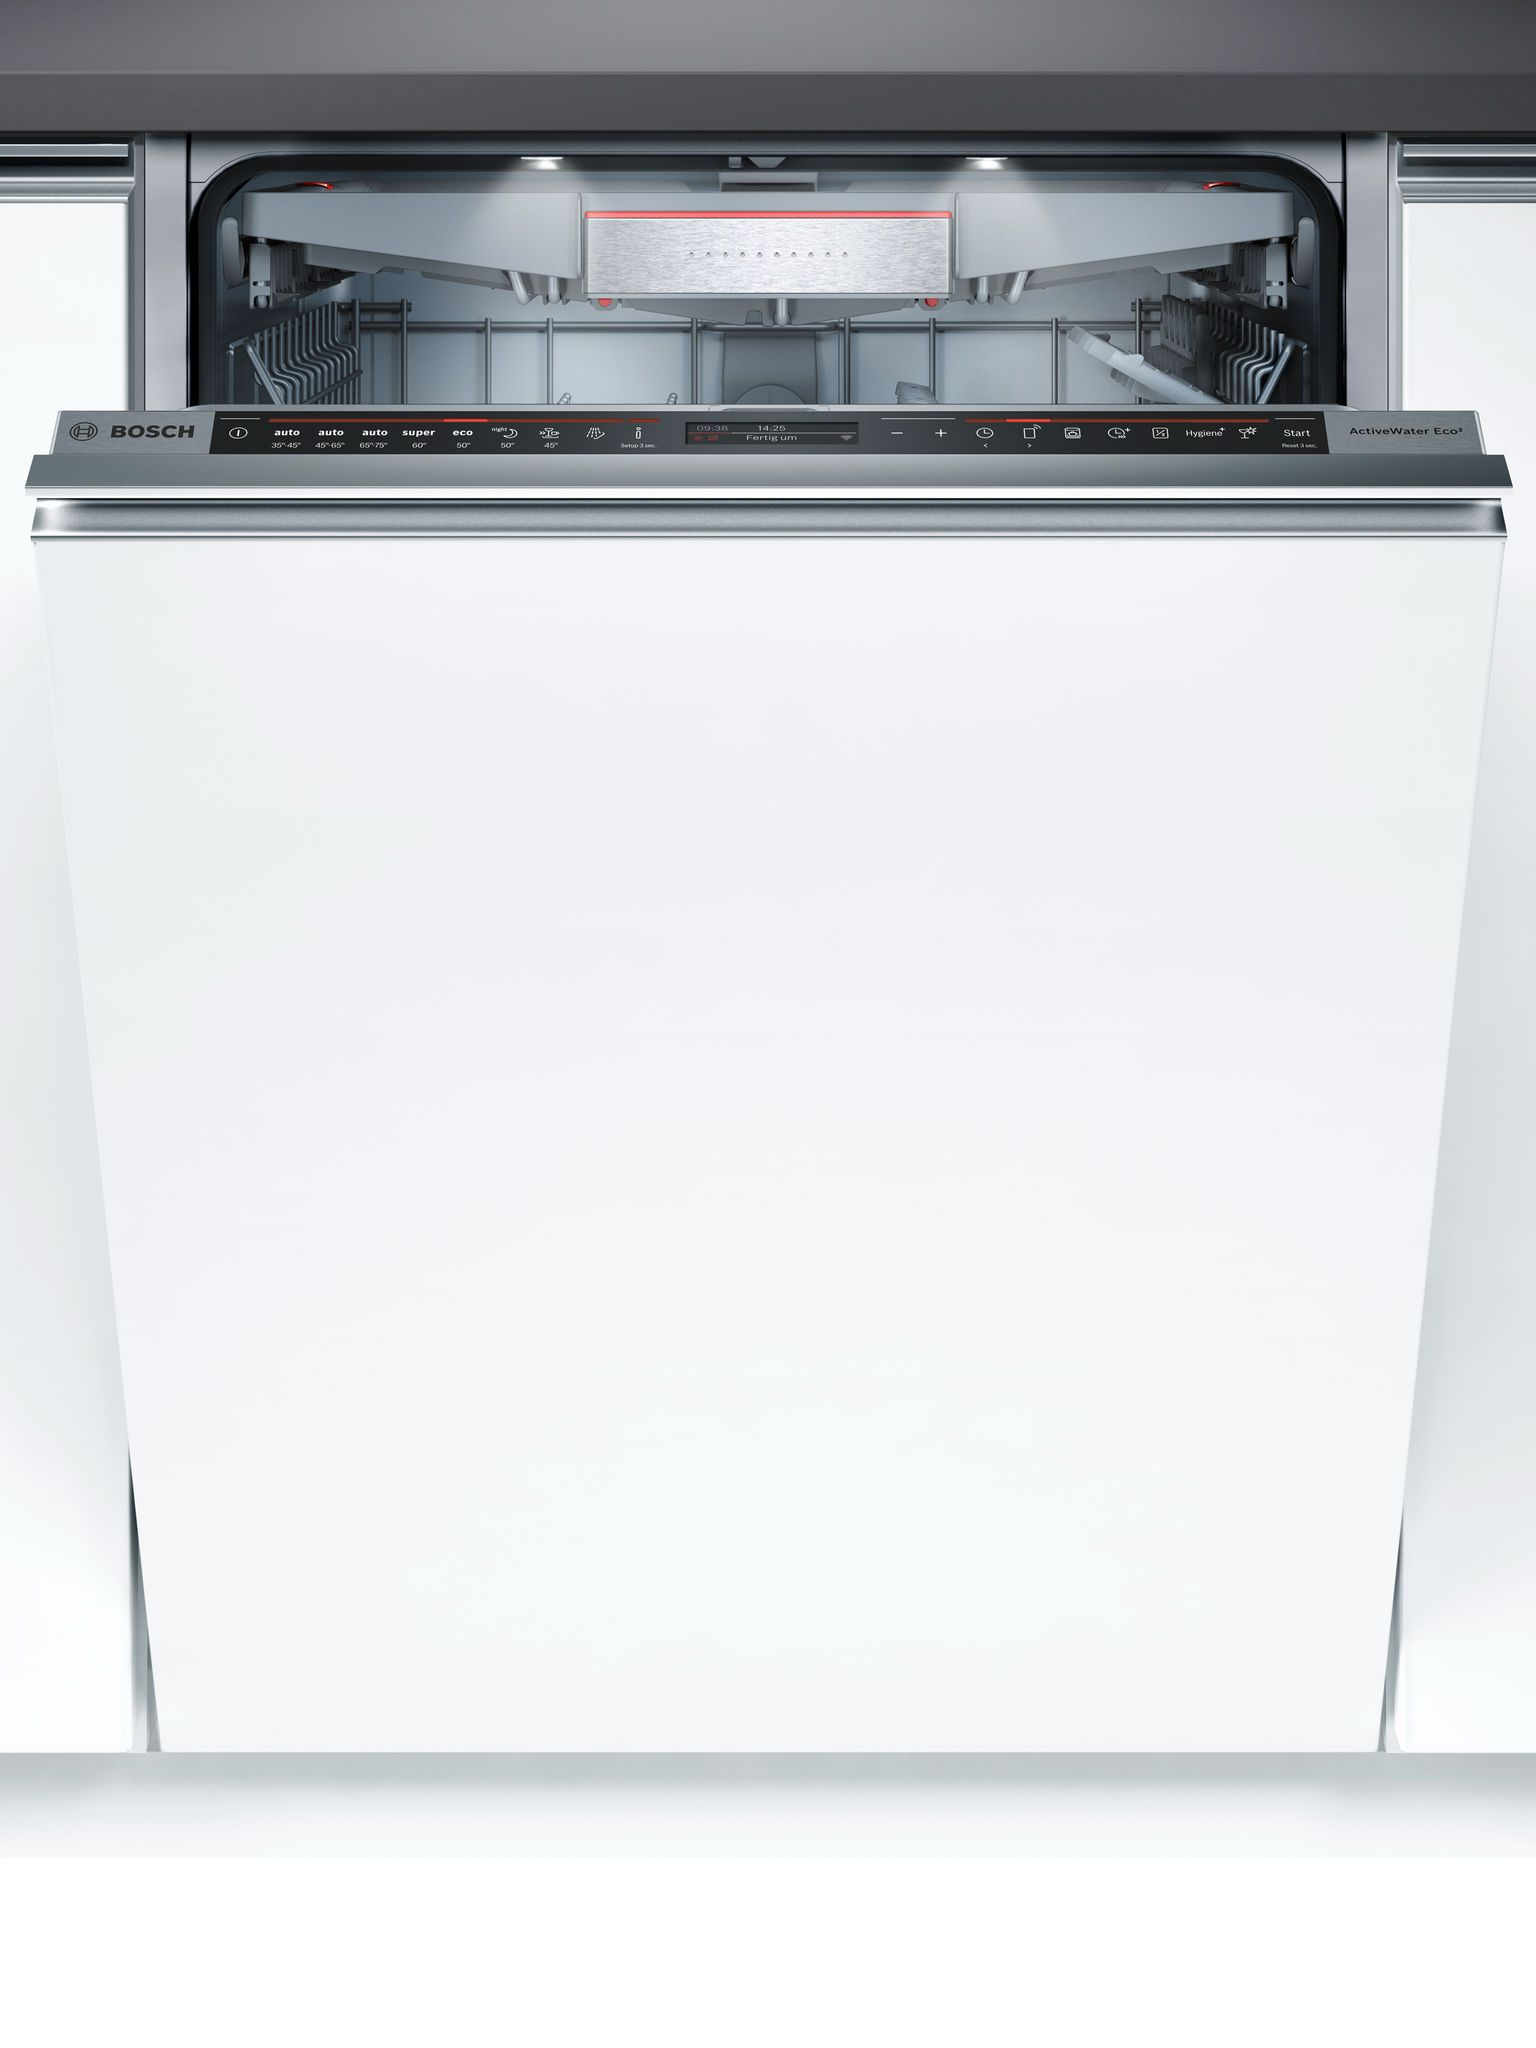 Fully integrated dishwasher Einbaugeschirrspüler